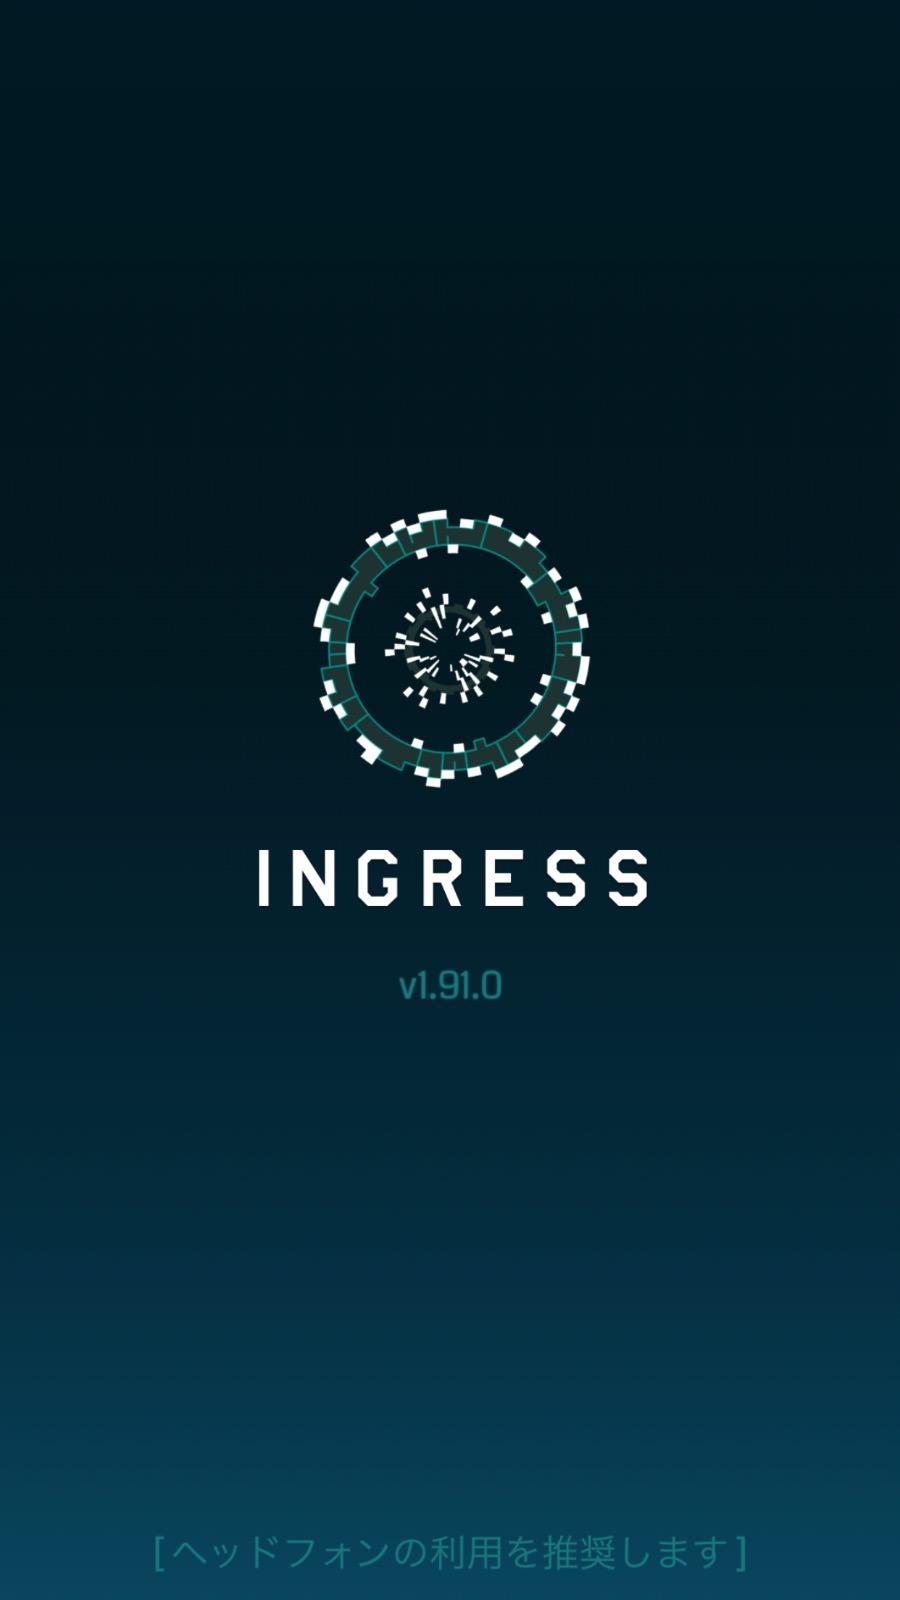 【Ingress】iOS版「Ingress 1.91.0」リリース → グリフハックをやり直す「REDO(リドゥー)」機能が追加